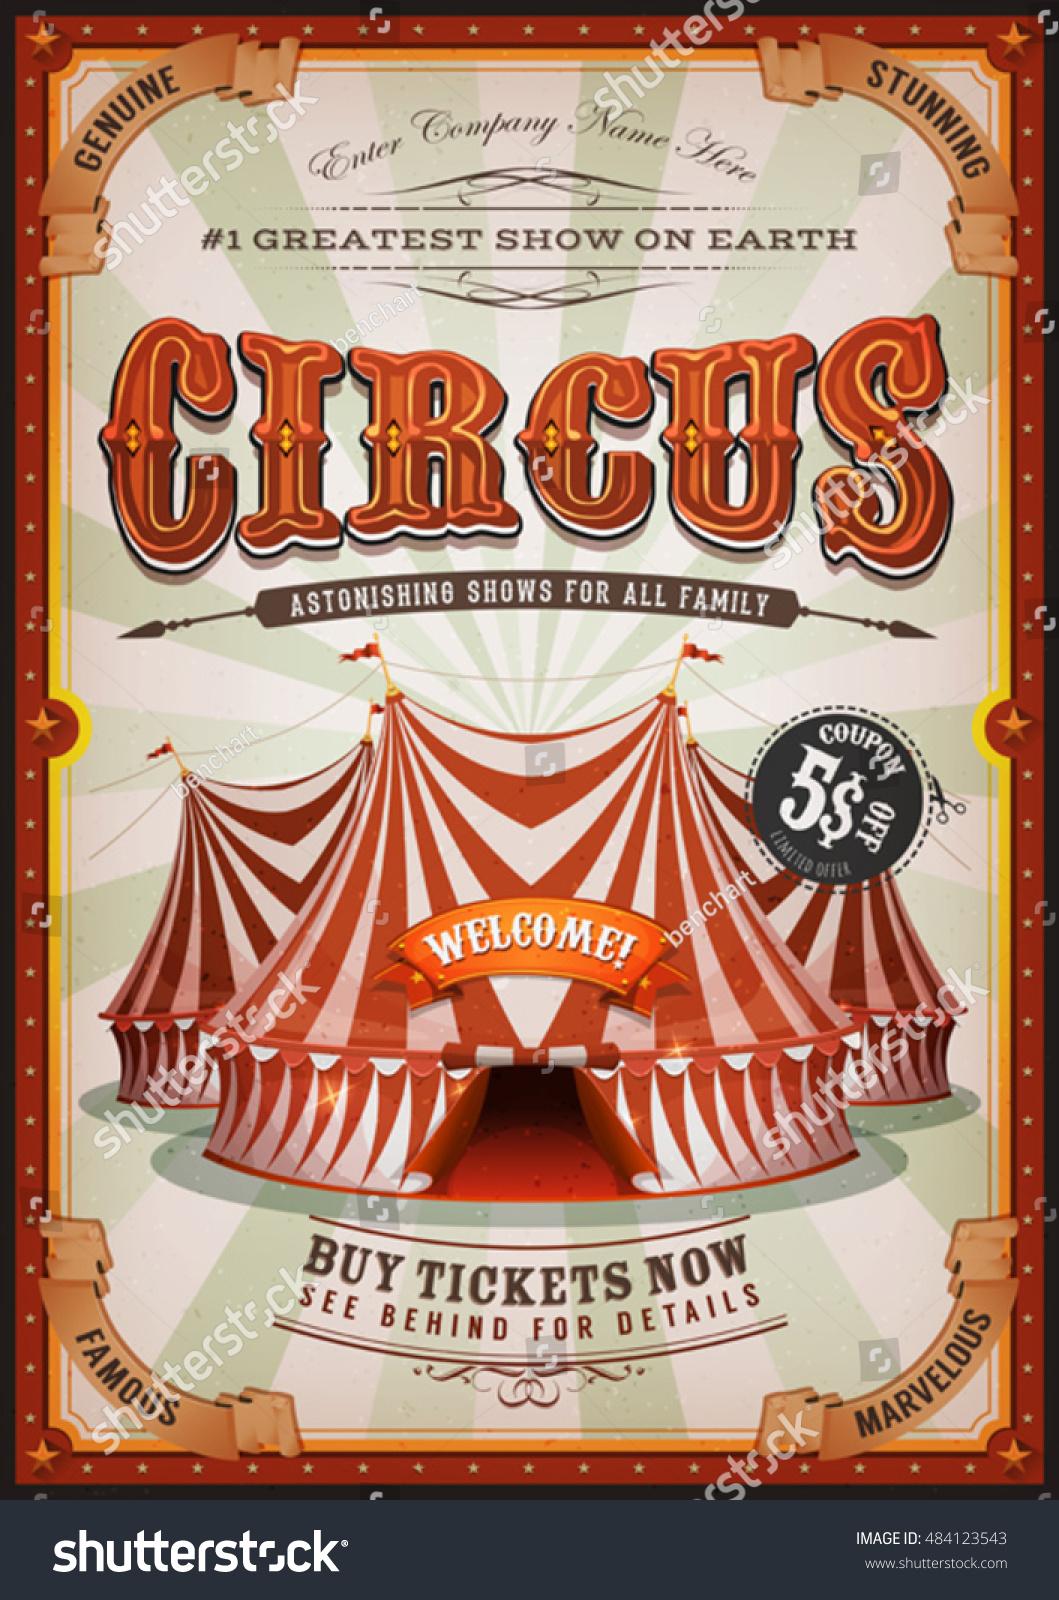 Vintage Circus Poster Big Top Retro Stock-Vektorgrafik 484123543 ...